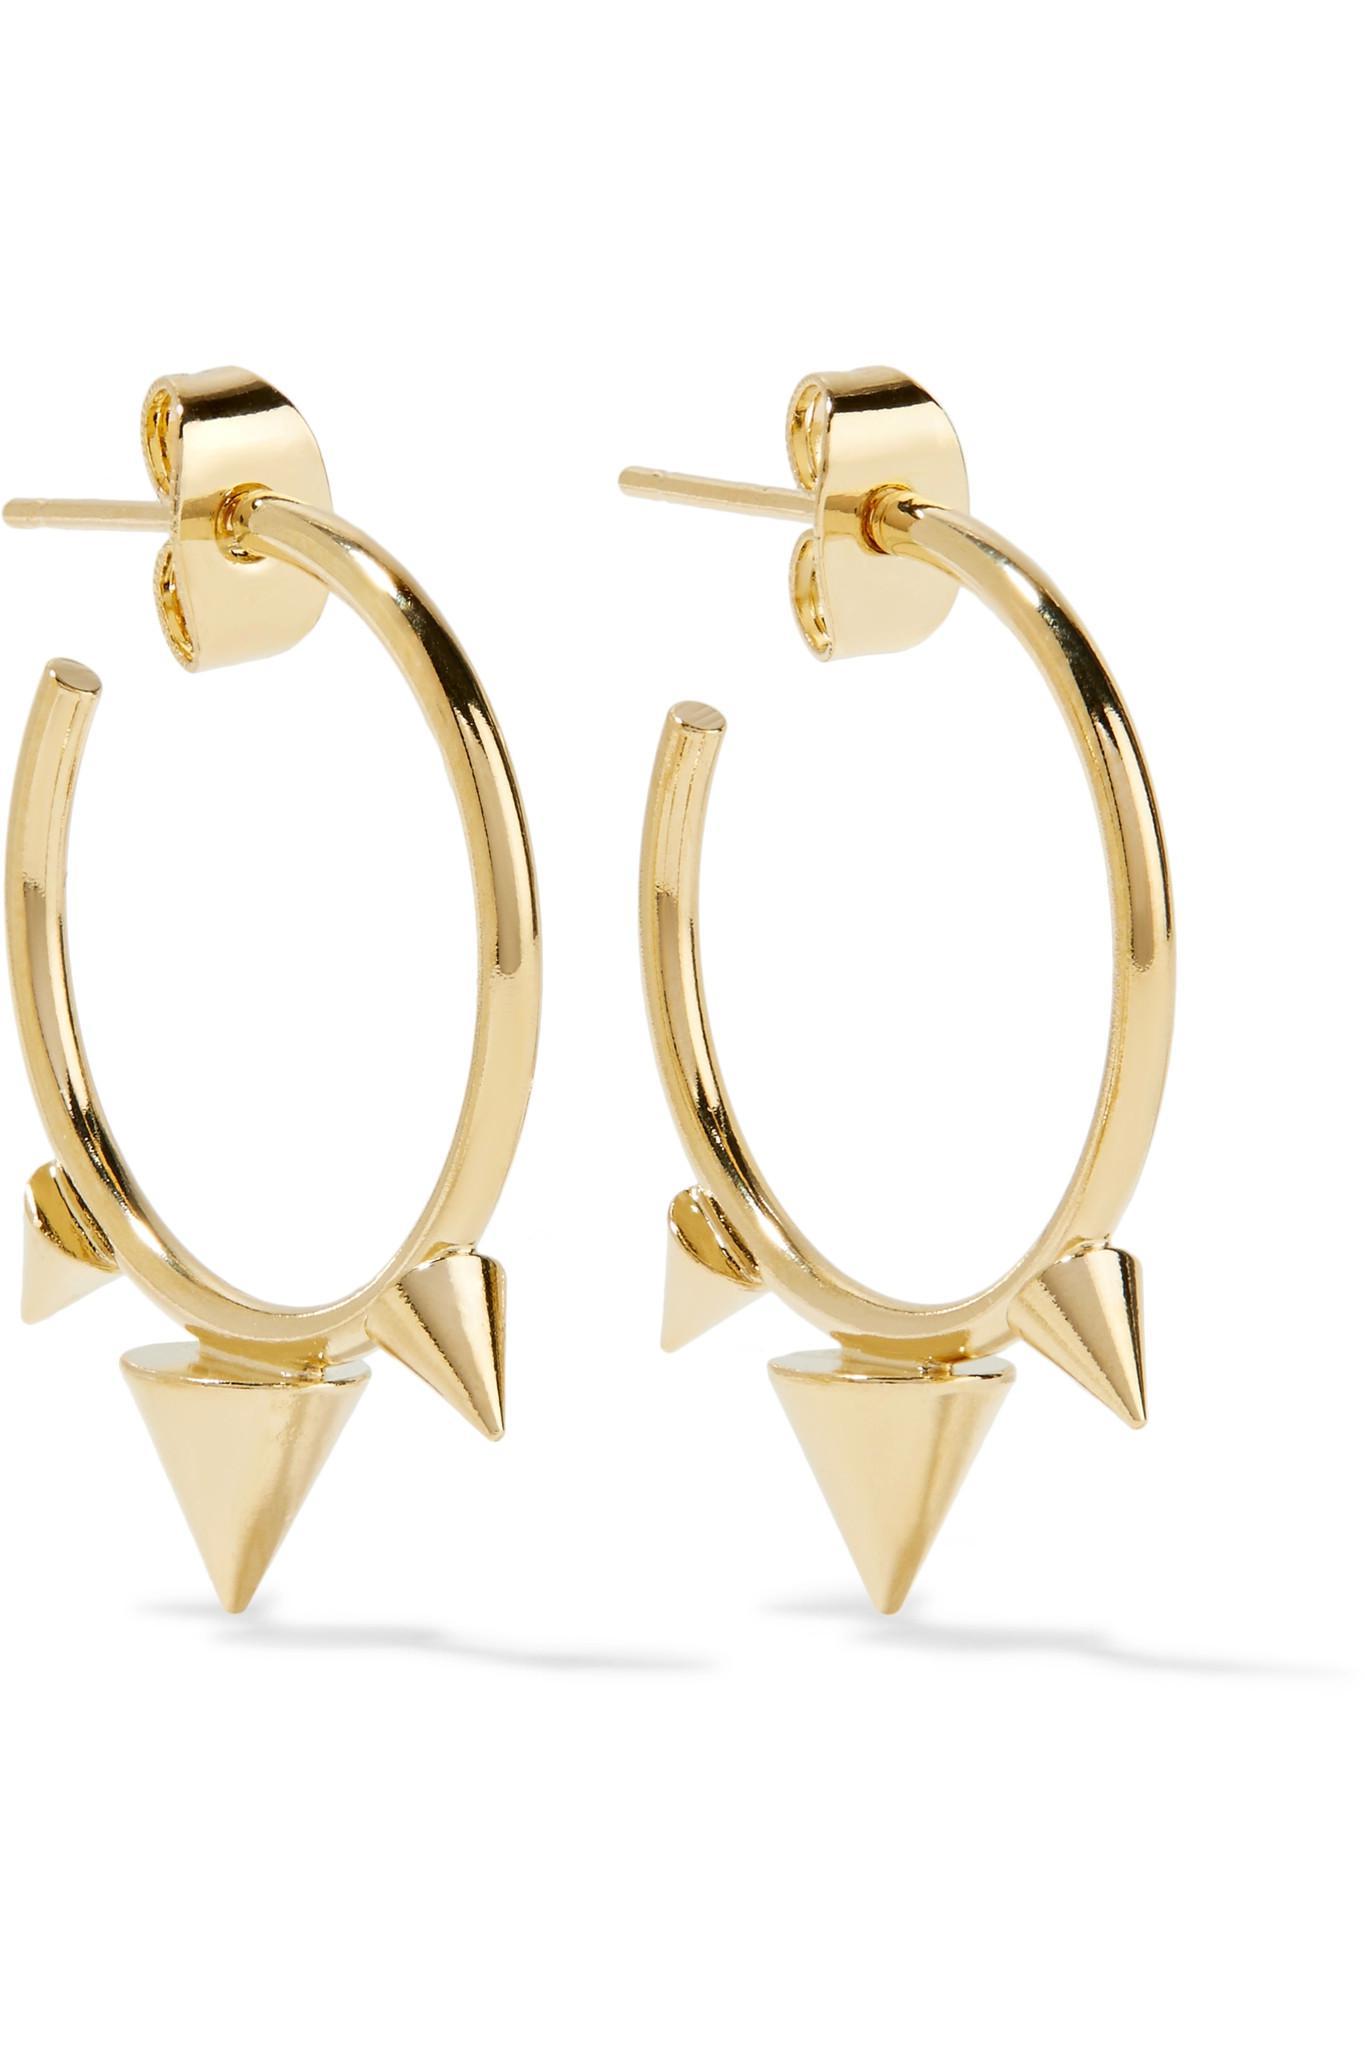 Isabel Marant Gold-tone Earrings PaJiq6